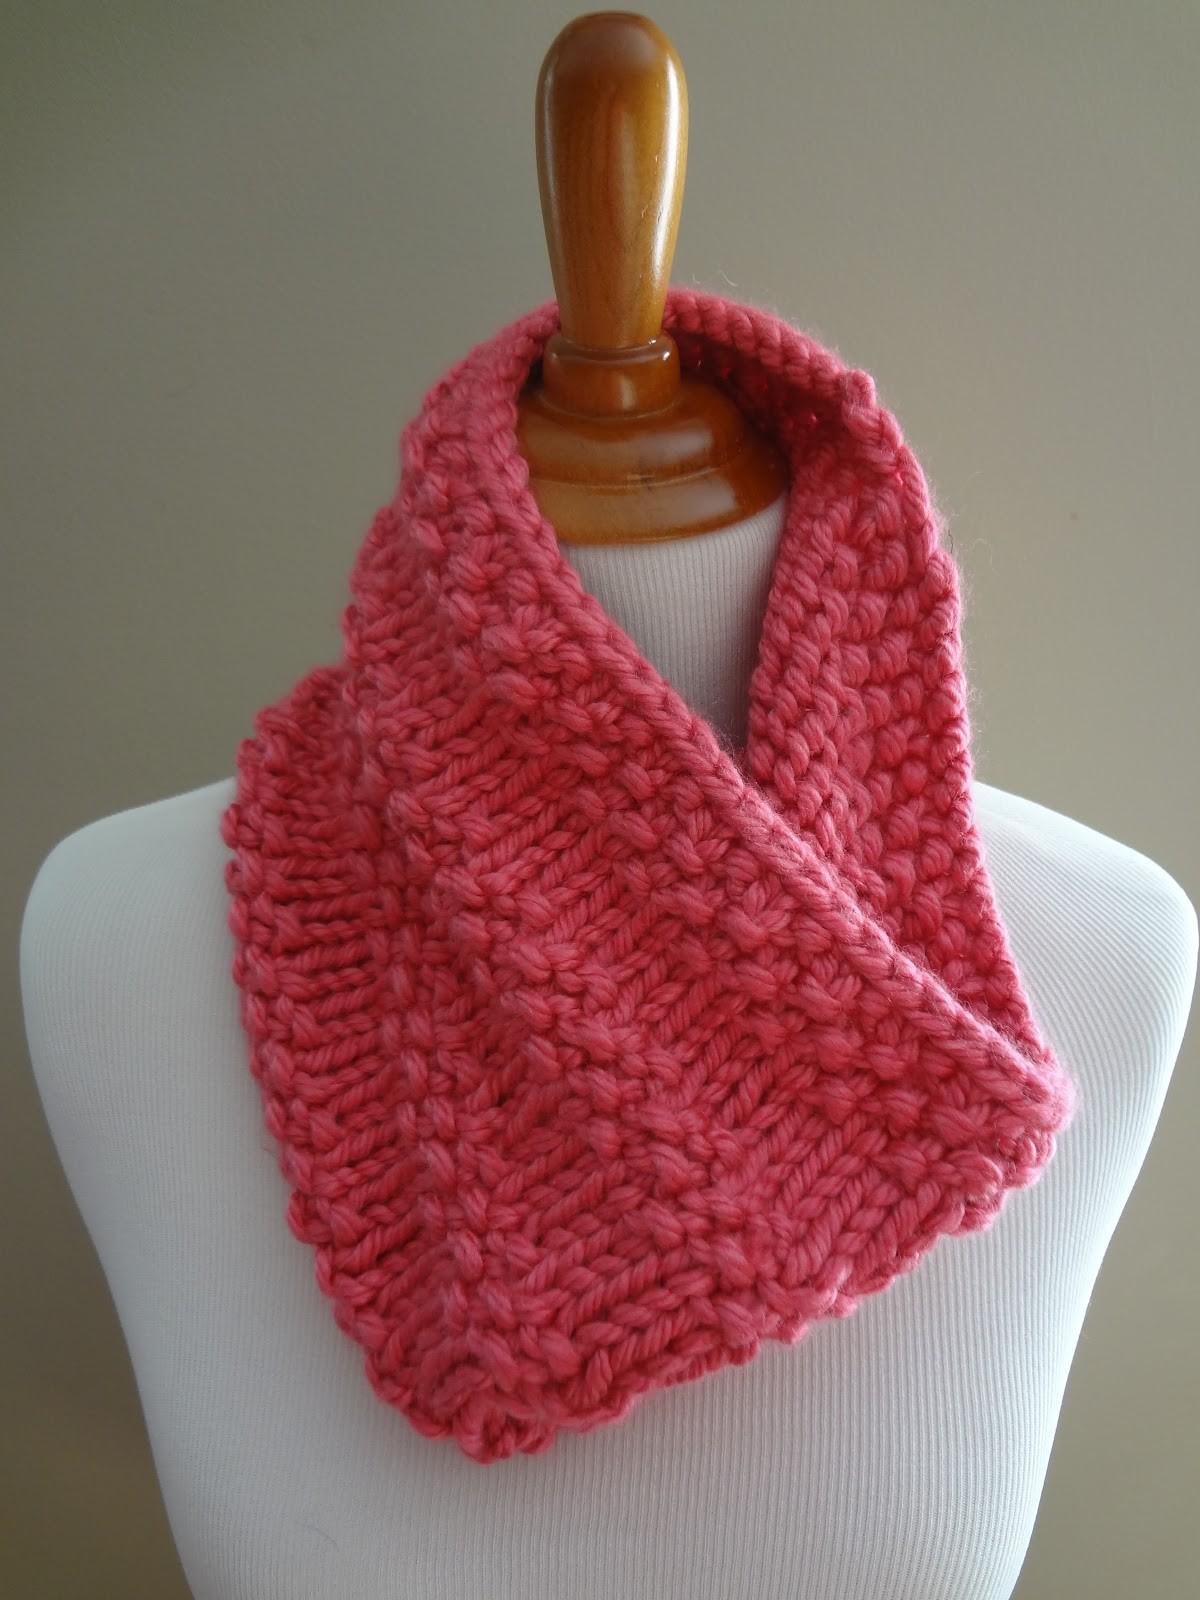 Bubblegum Cowl Knitting Pattern